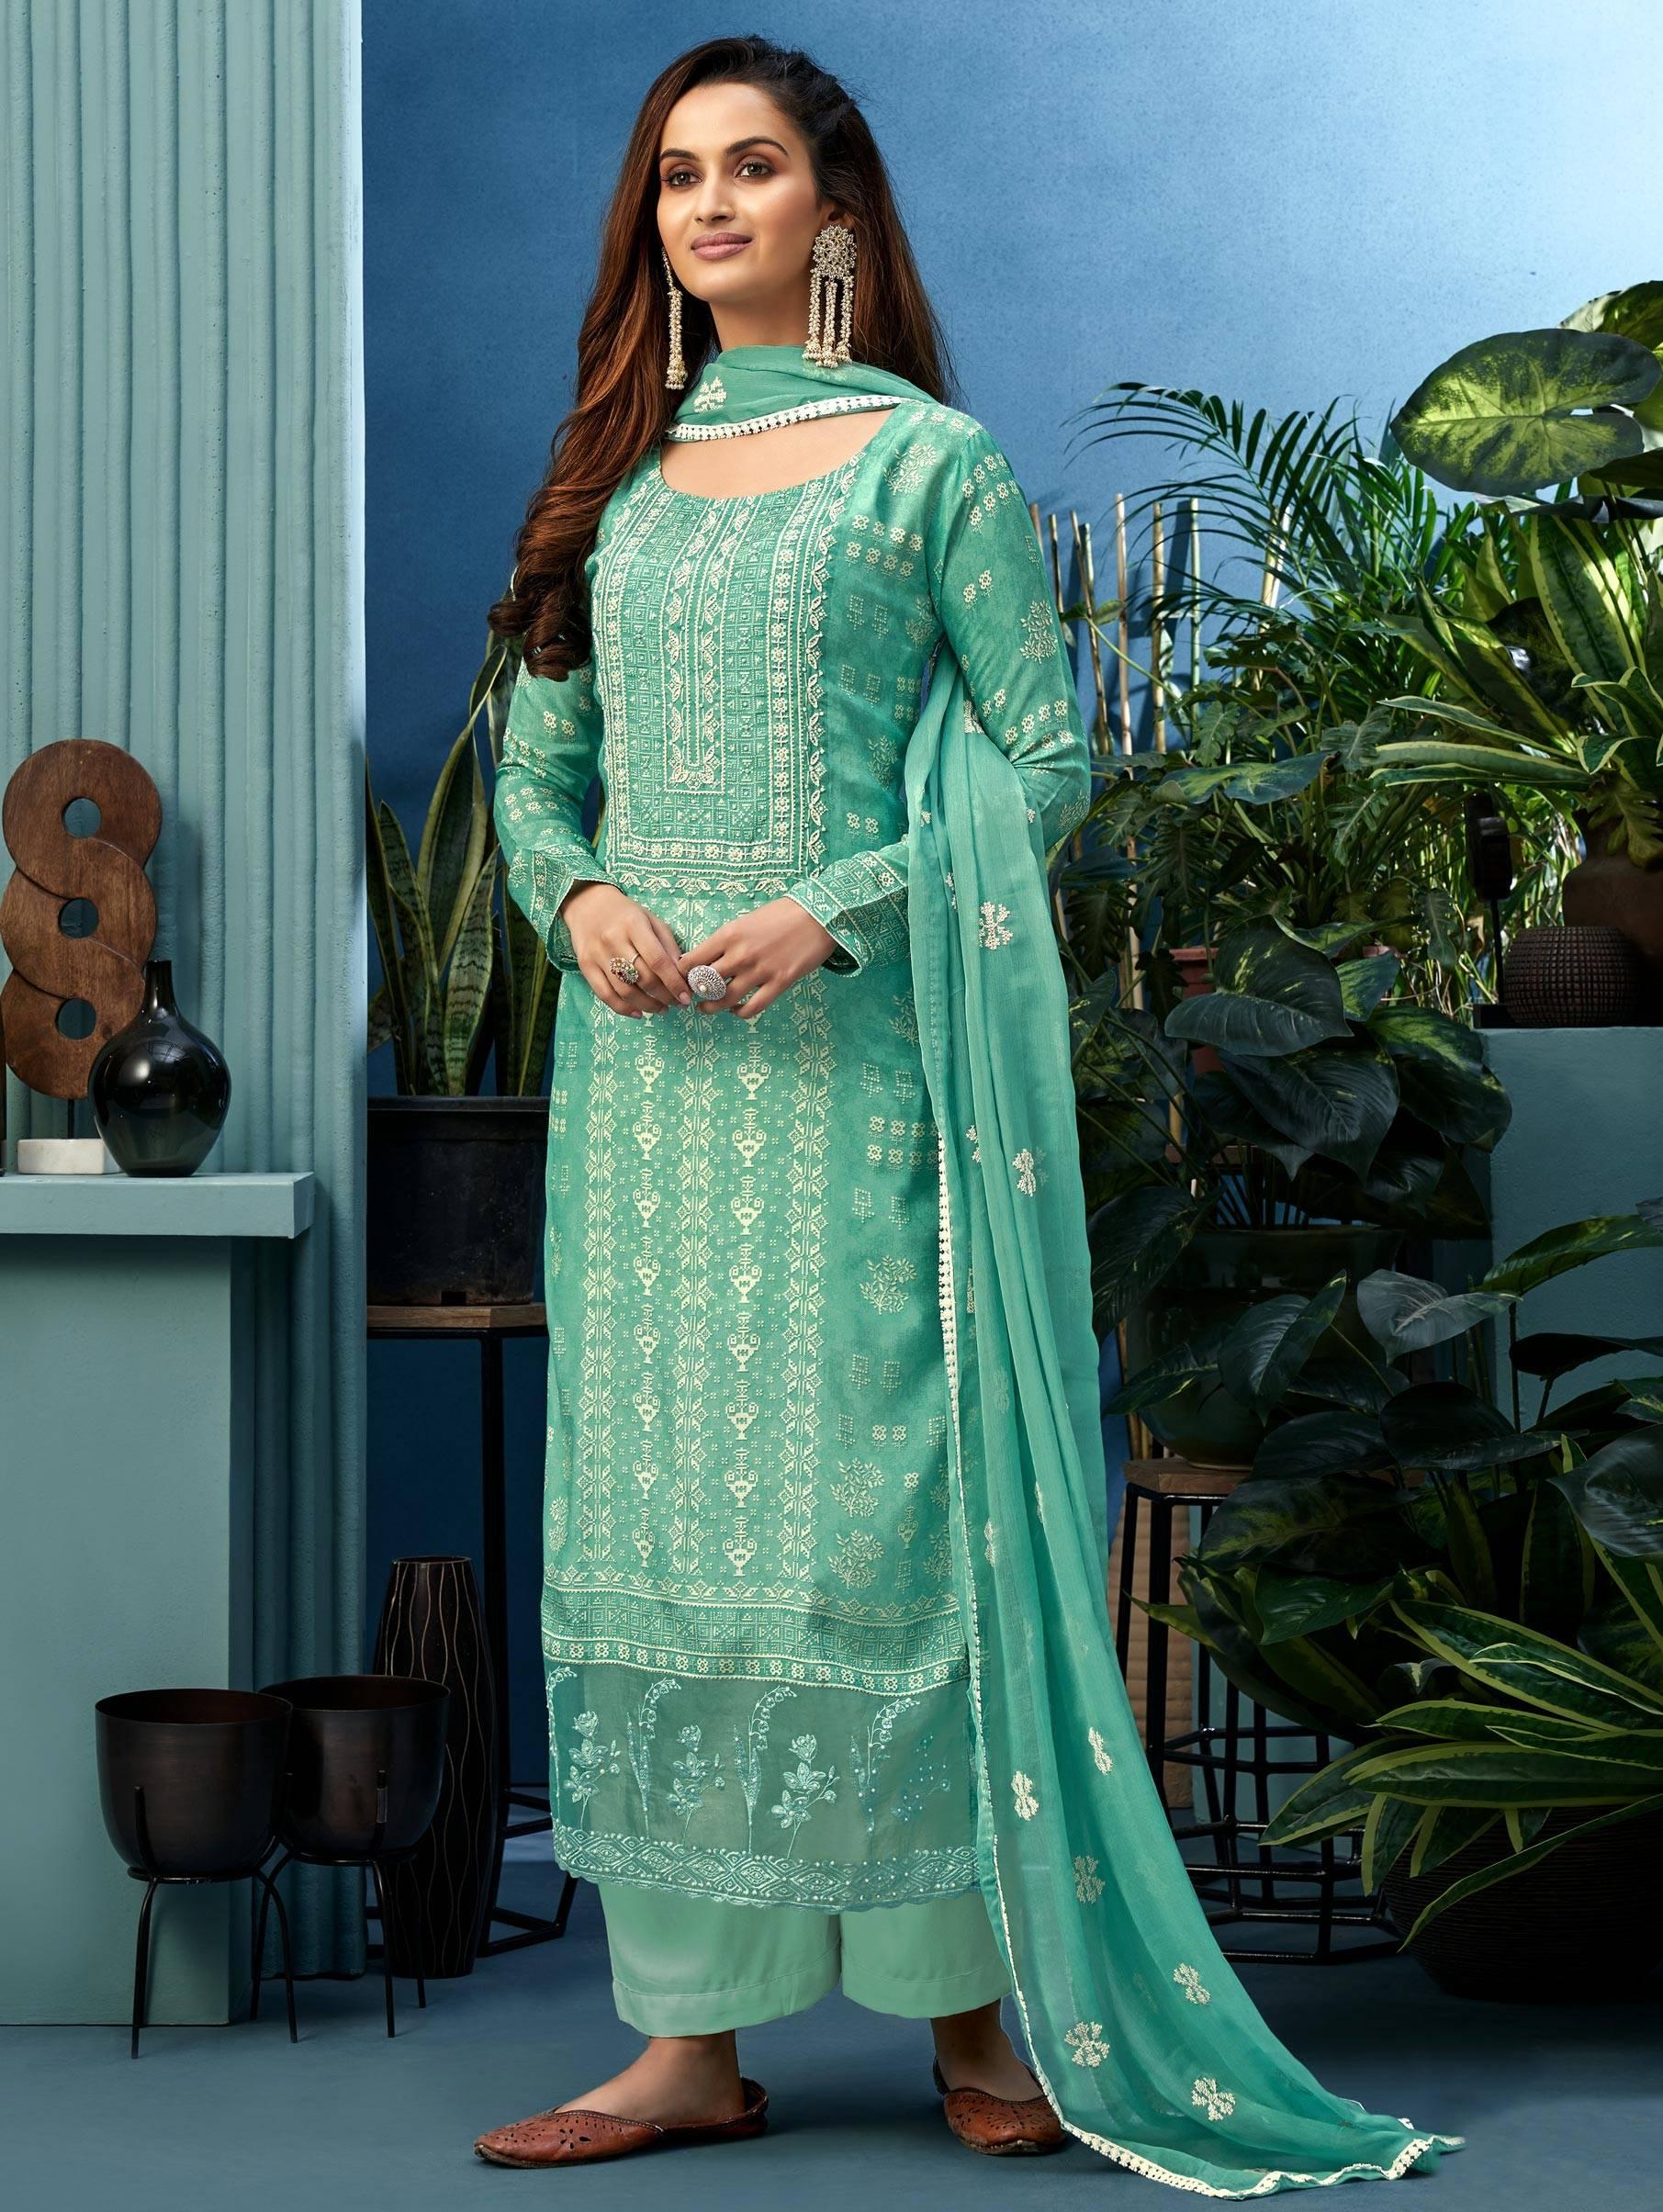 Sky Blue Punjabi Suit Party Wear with Heavy Dupatta